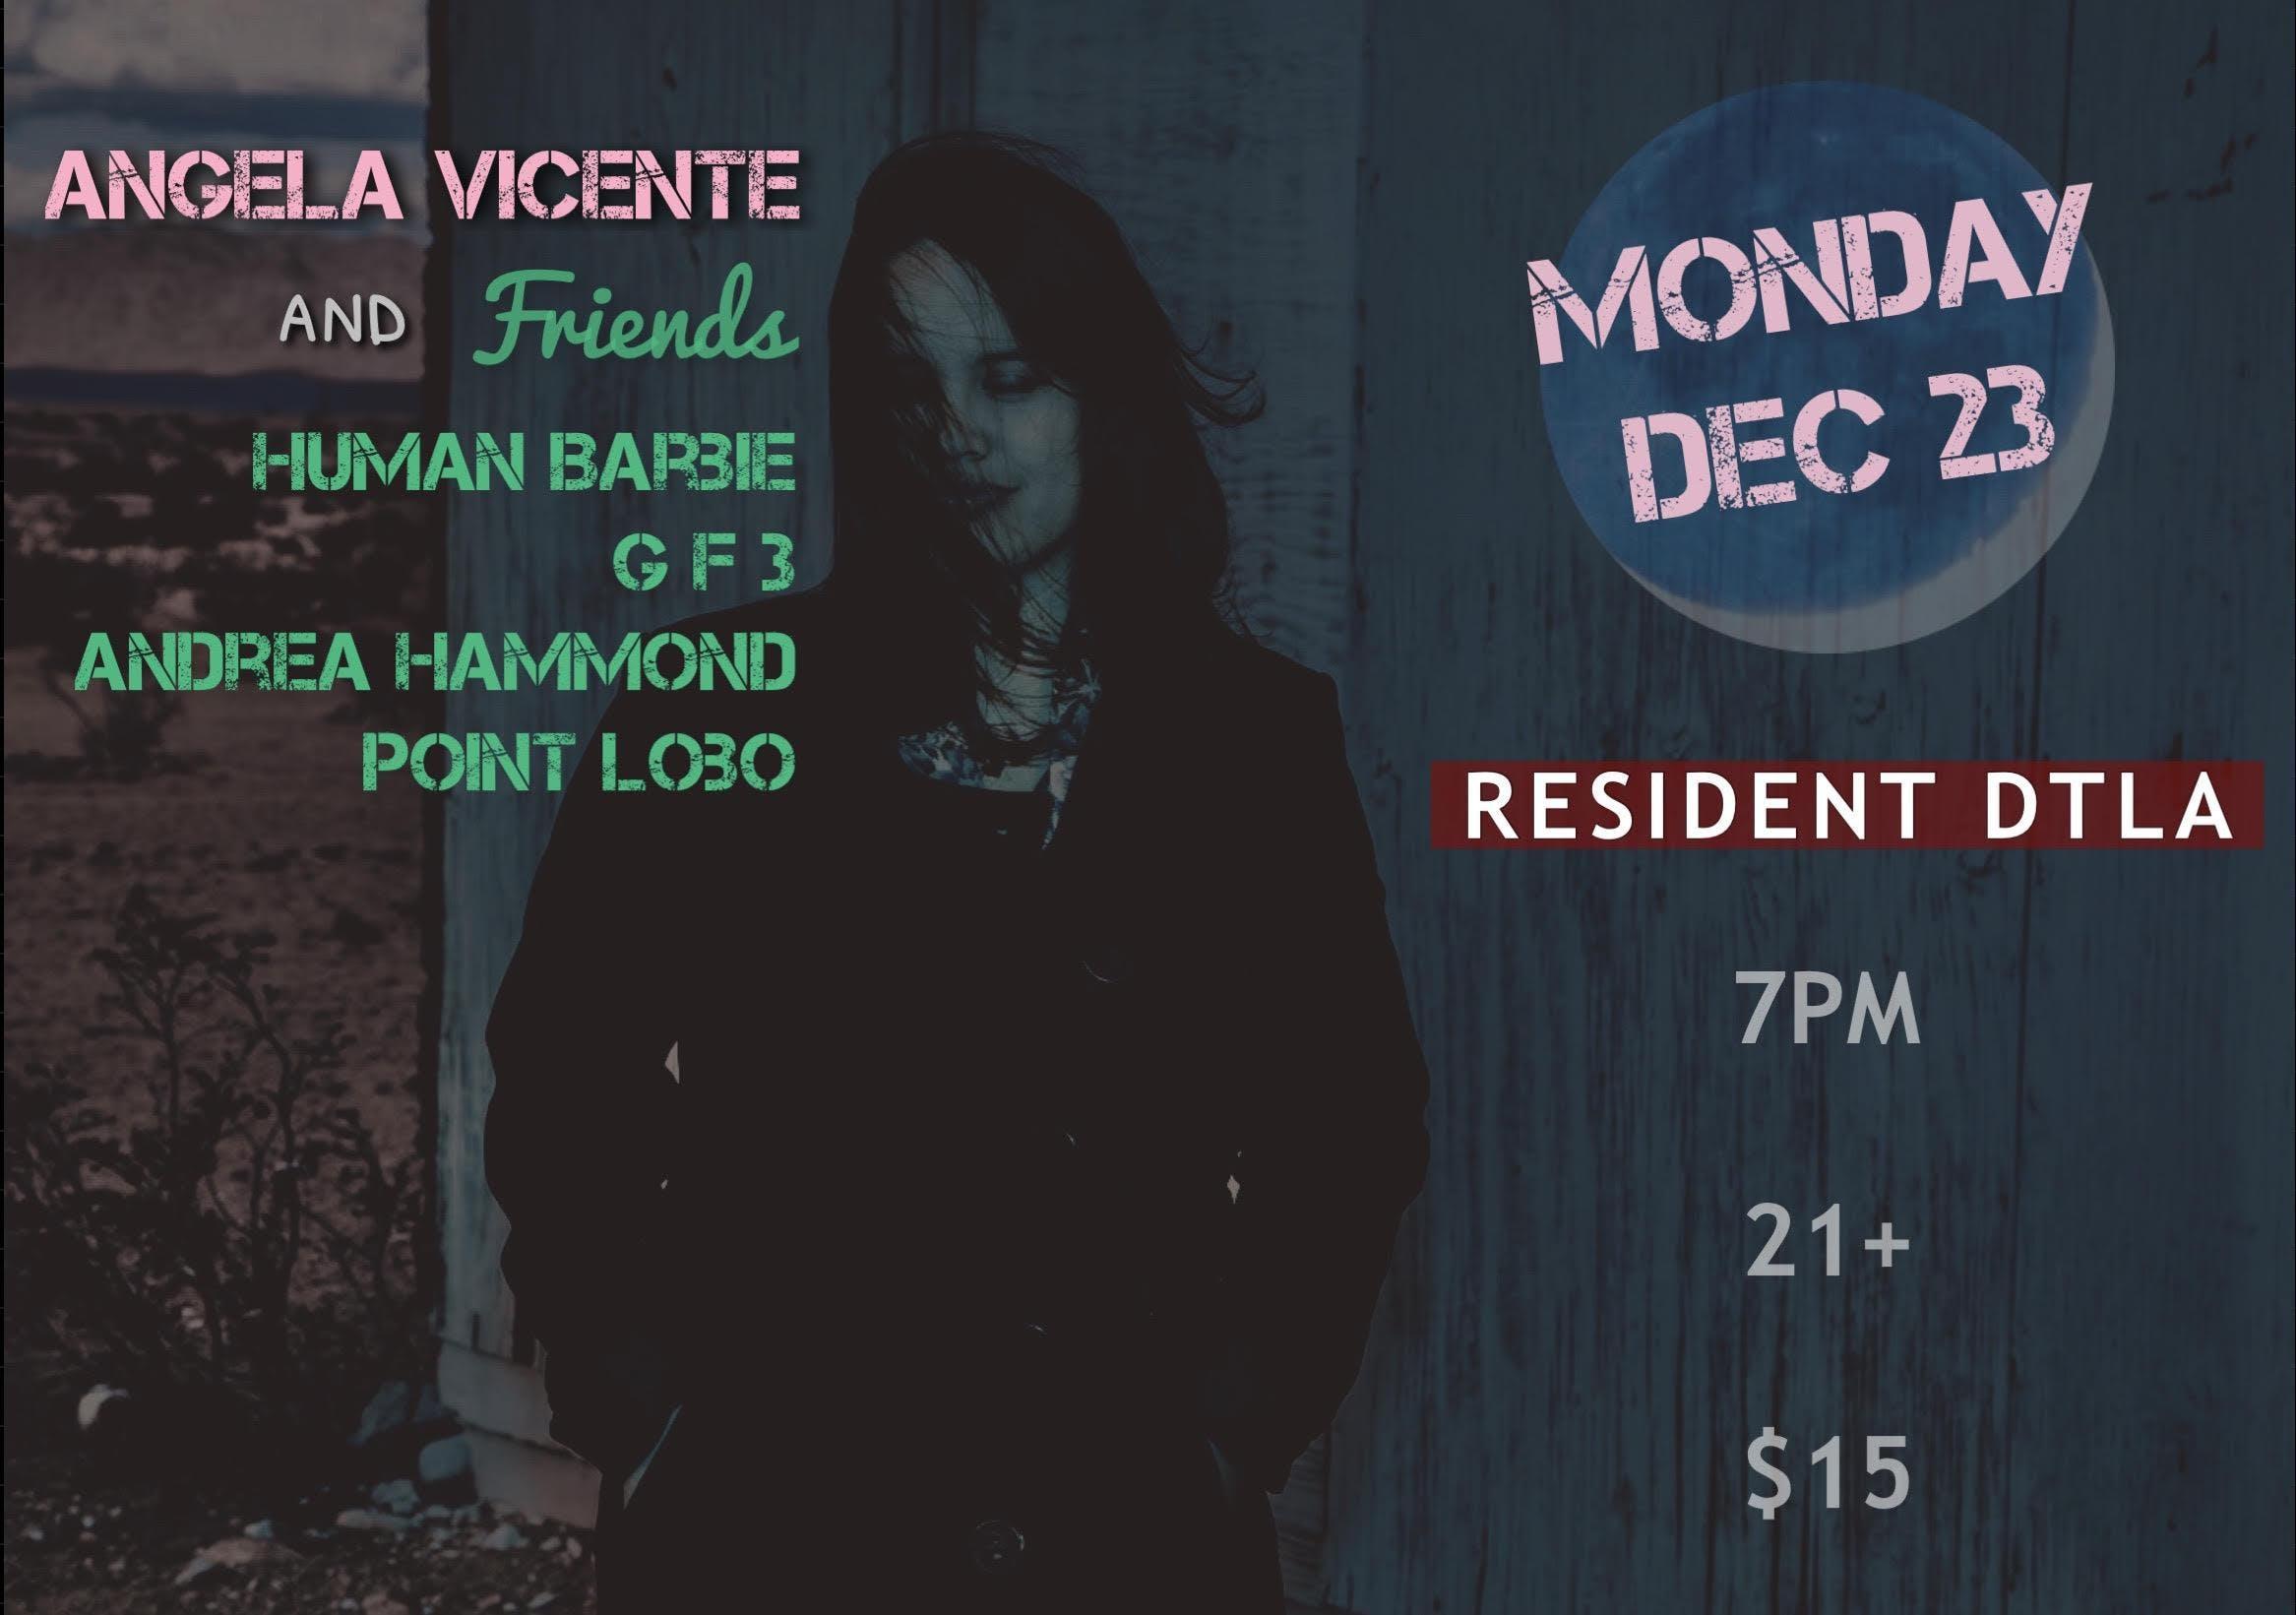 Angela Vicente and Friends: Human Barbie, GF3, Andrea Hammond, Point Lobo